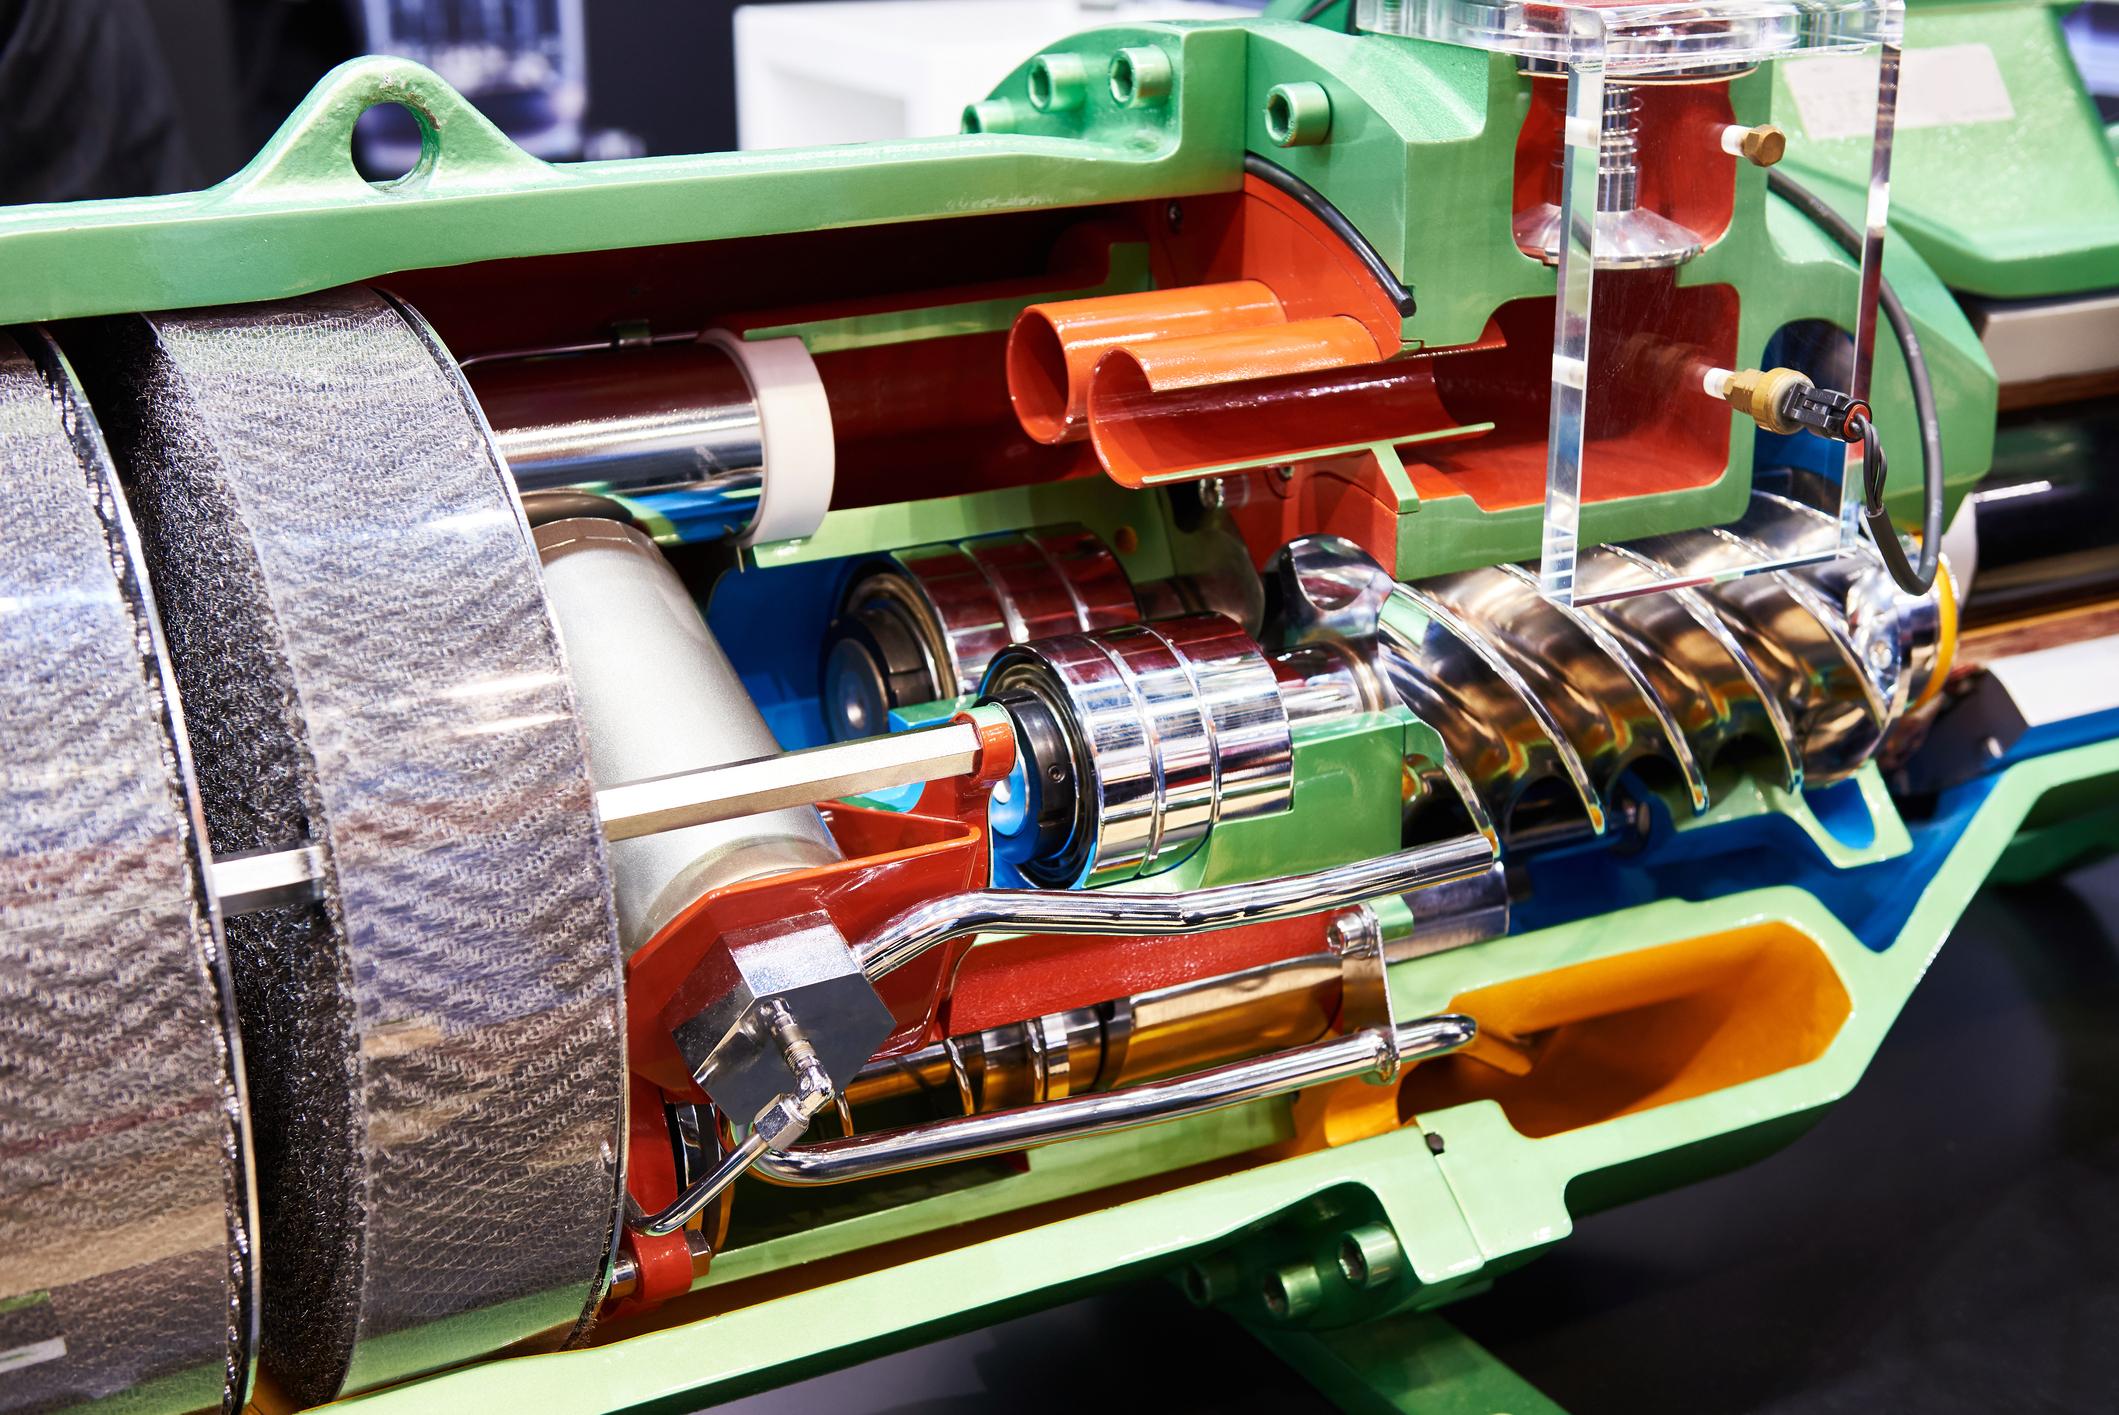 Semi-Hermetic Compact Screw Compressor in cut section